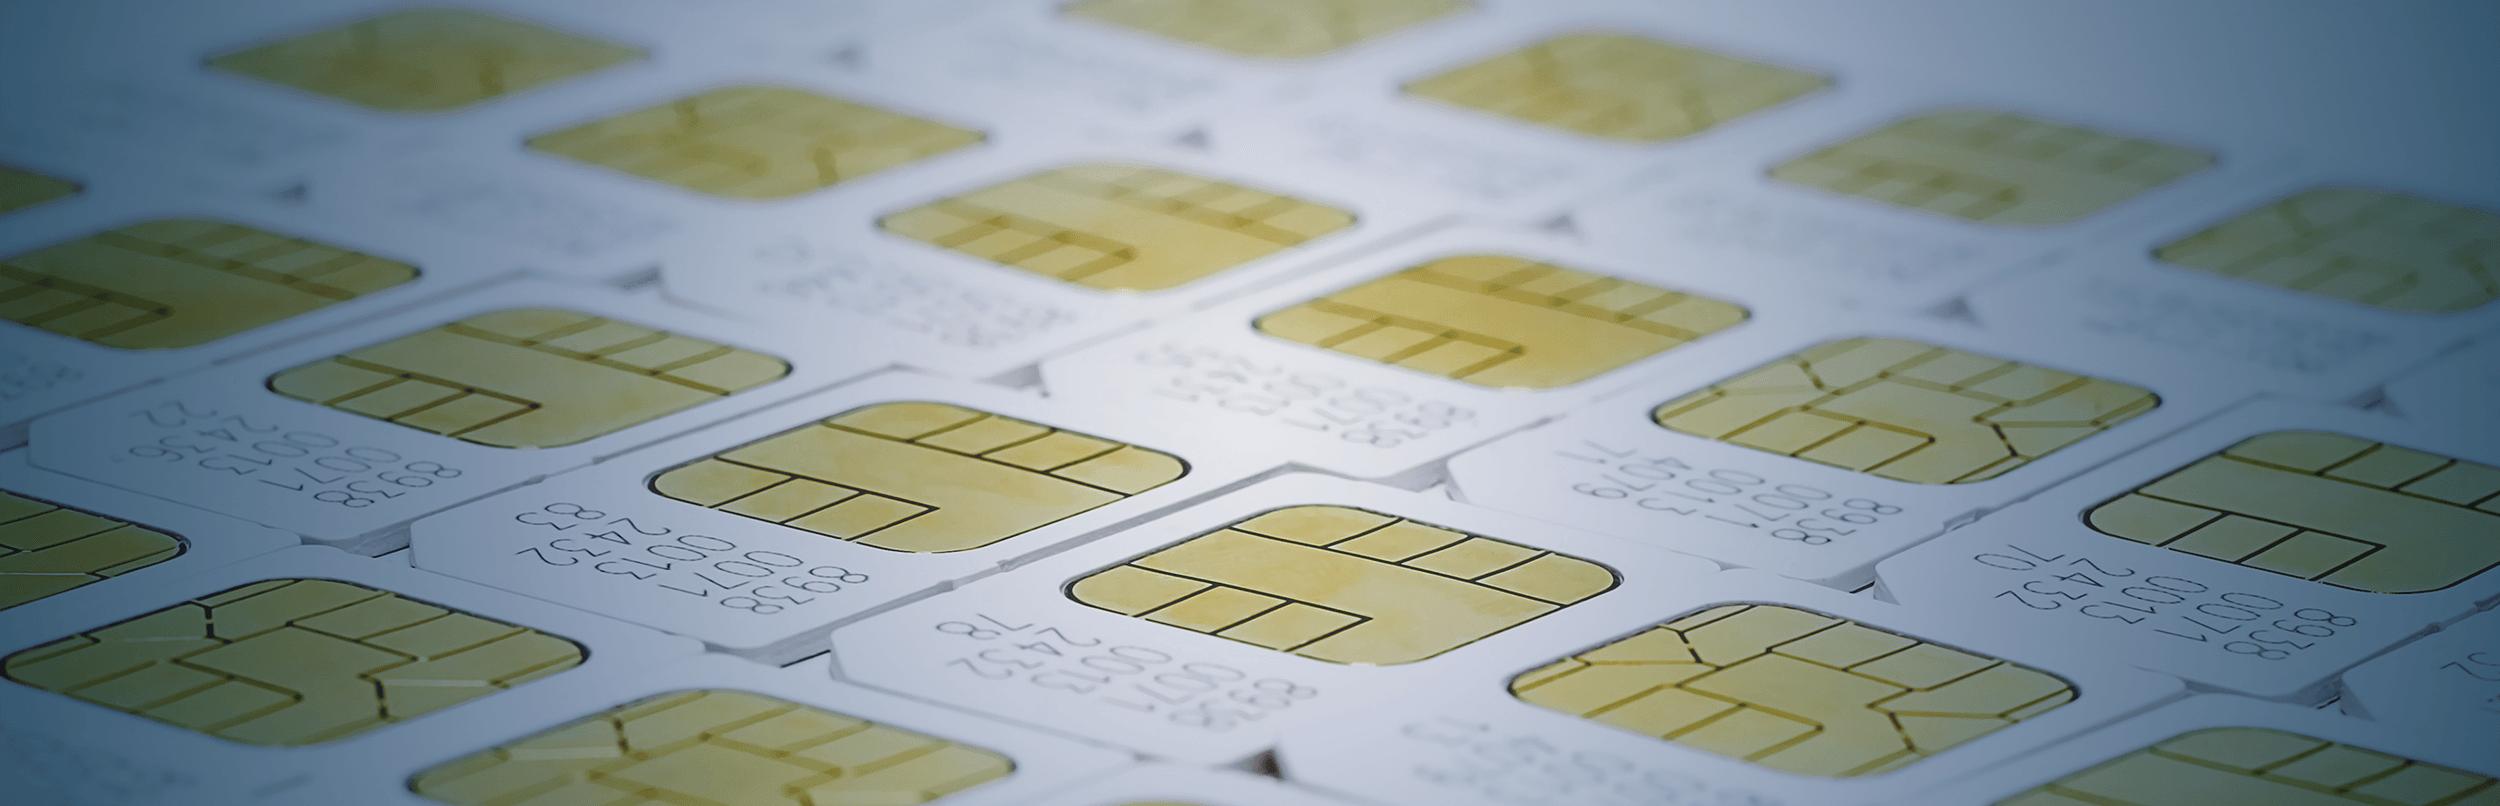 SIM卡作为电梯组件安全吗?